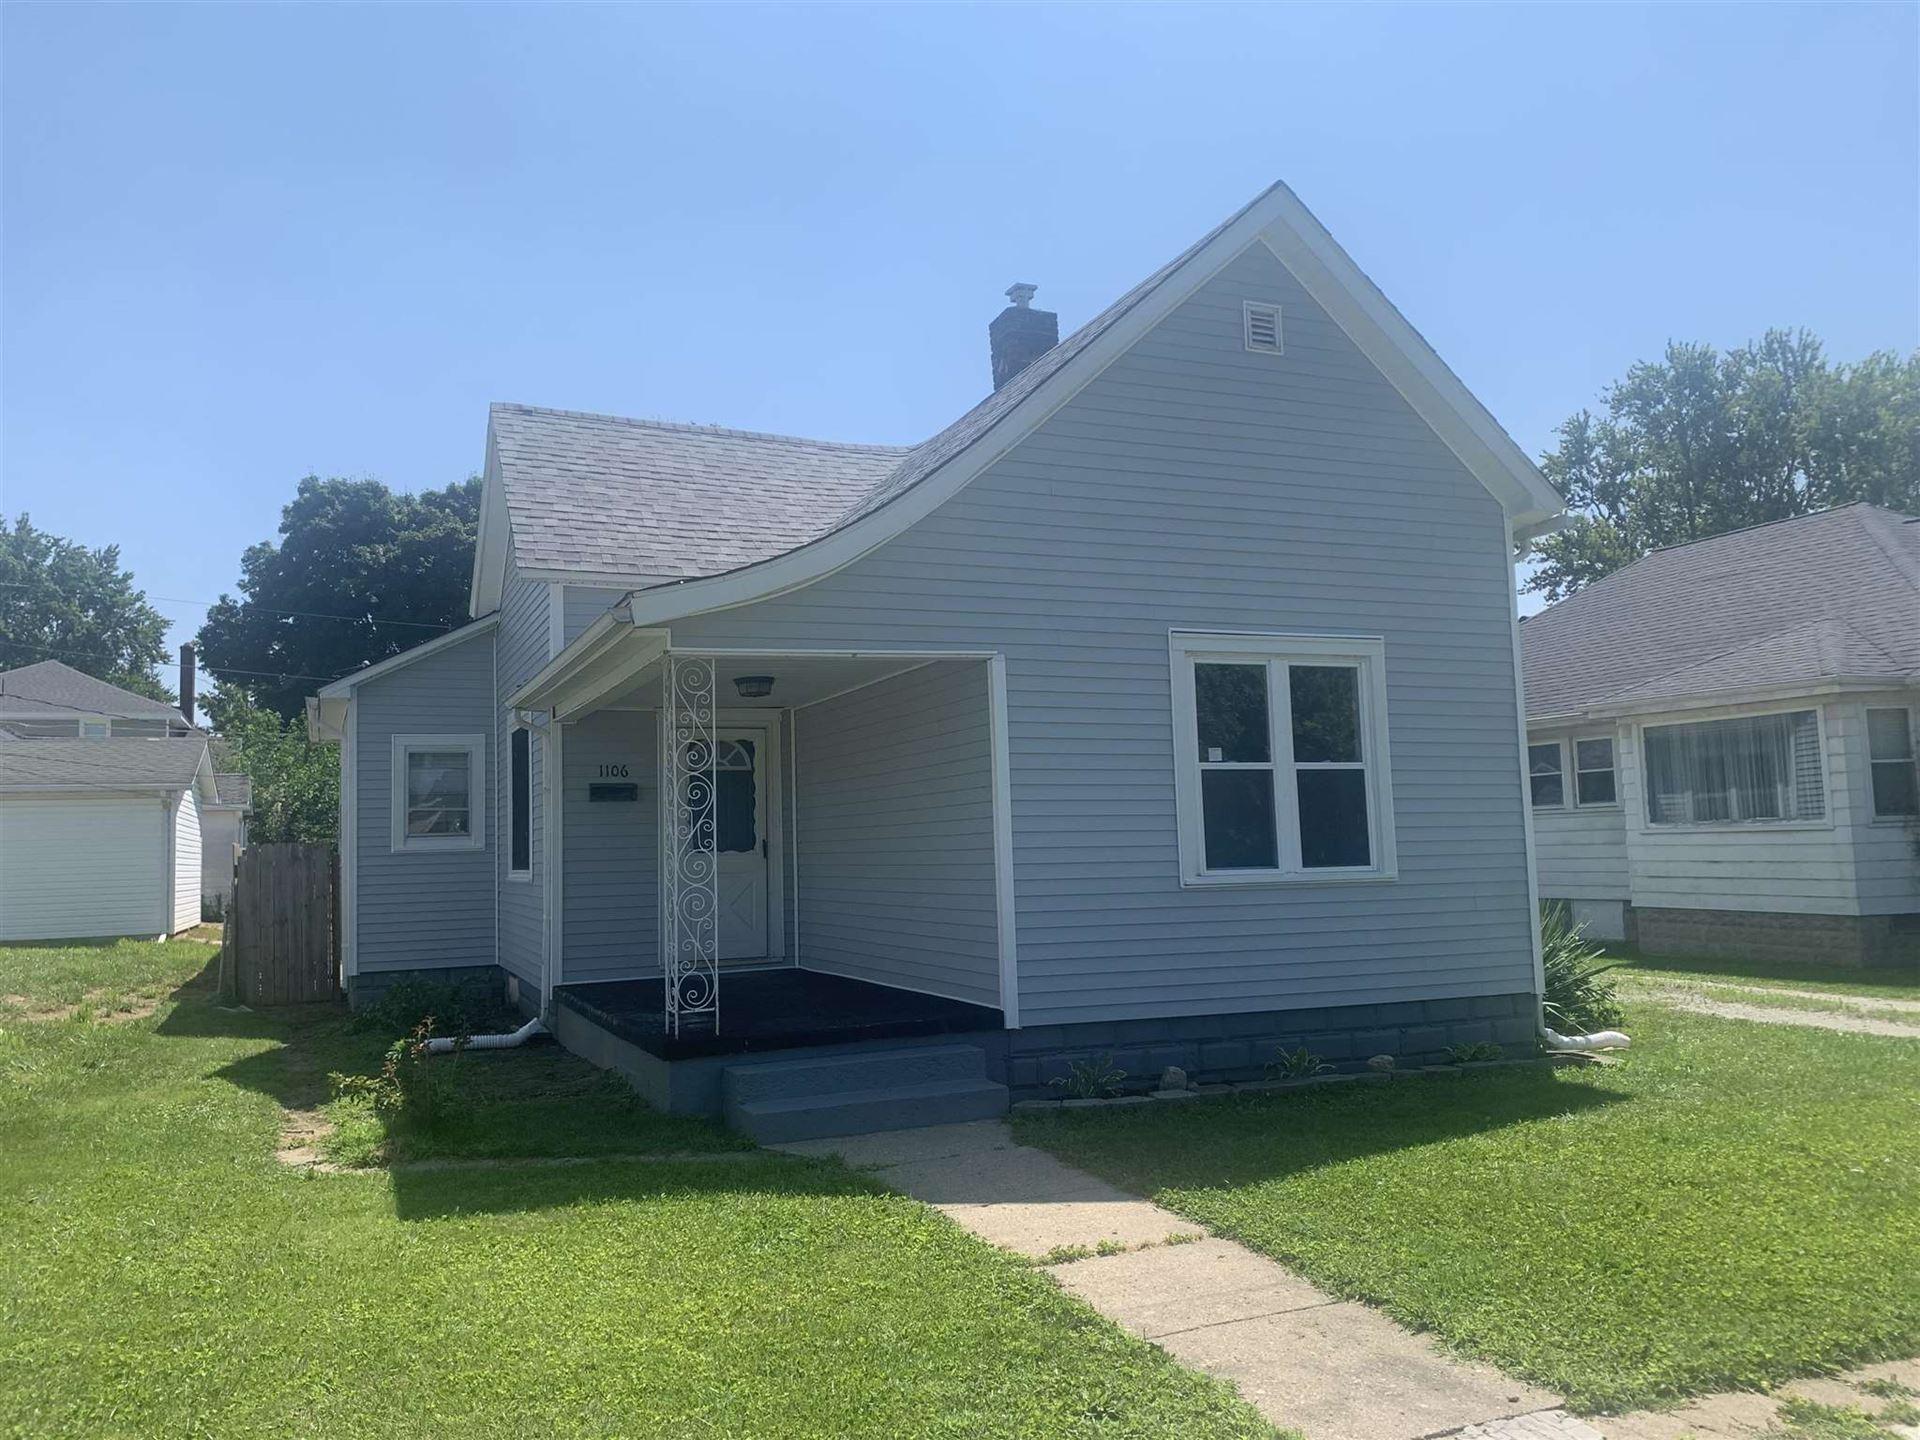 1106 S Armstrong Street, Kokomo, IN 46902 - MLS#: 202130989